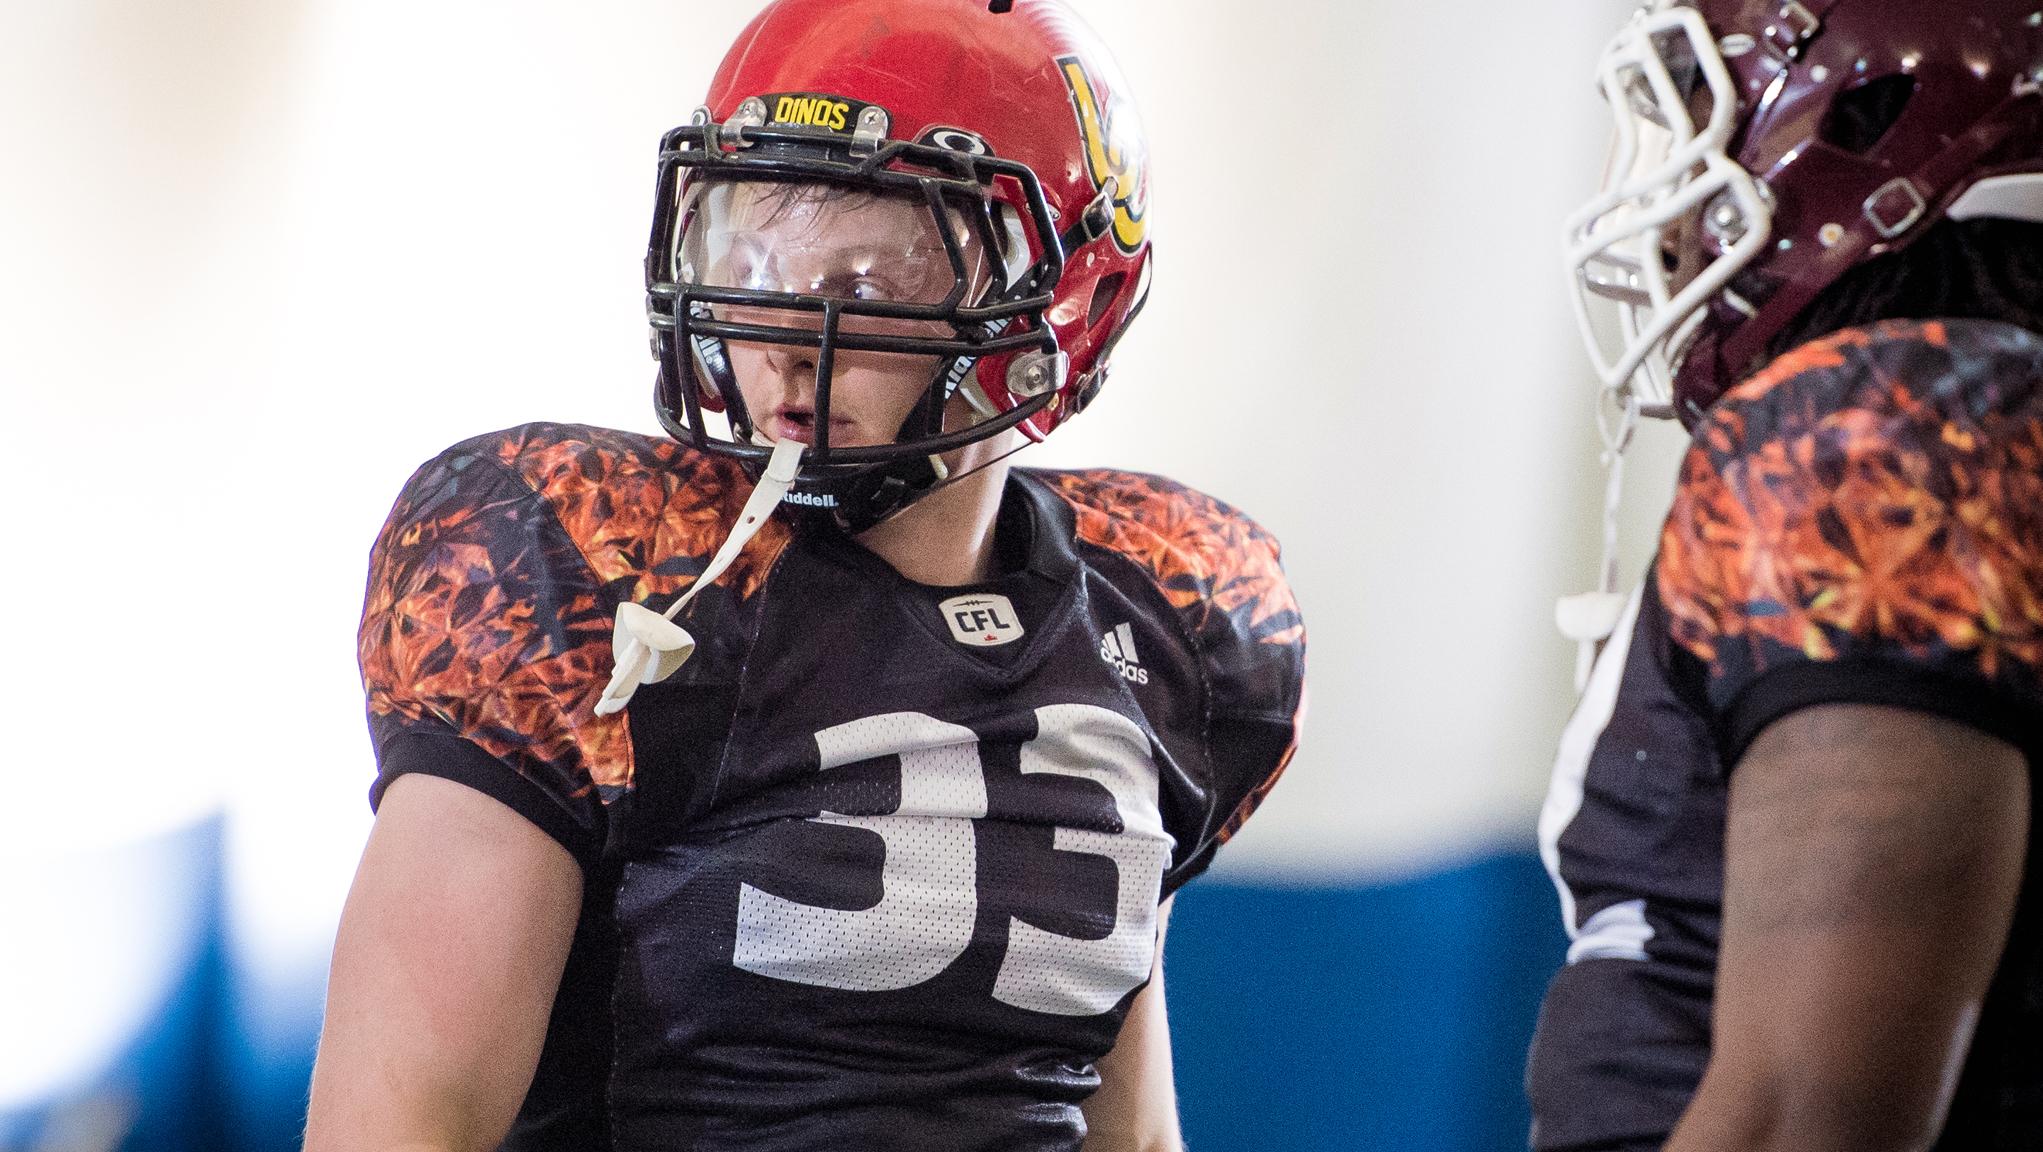 ec50454eaf8 Prospect Profile: CFL runs in the blood for Mercer Timmis - Toronto ...